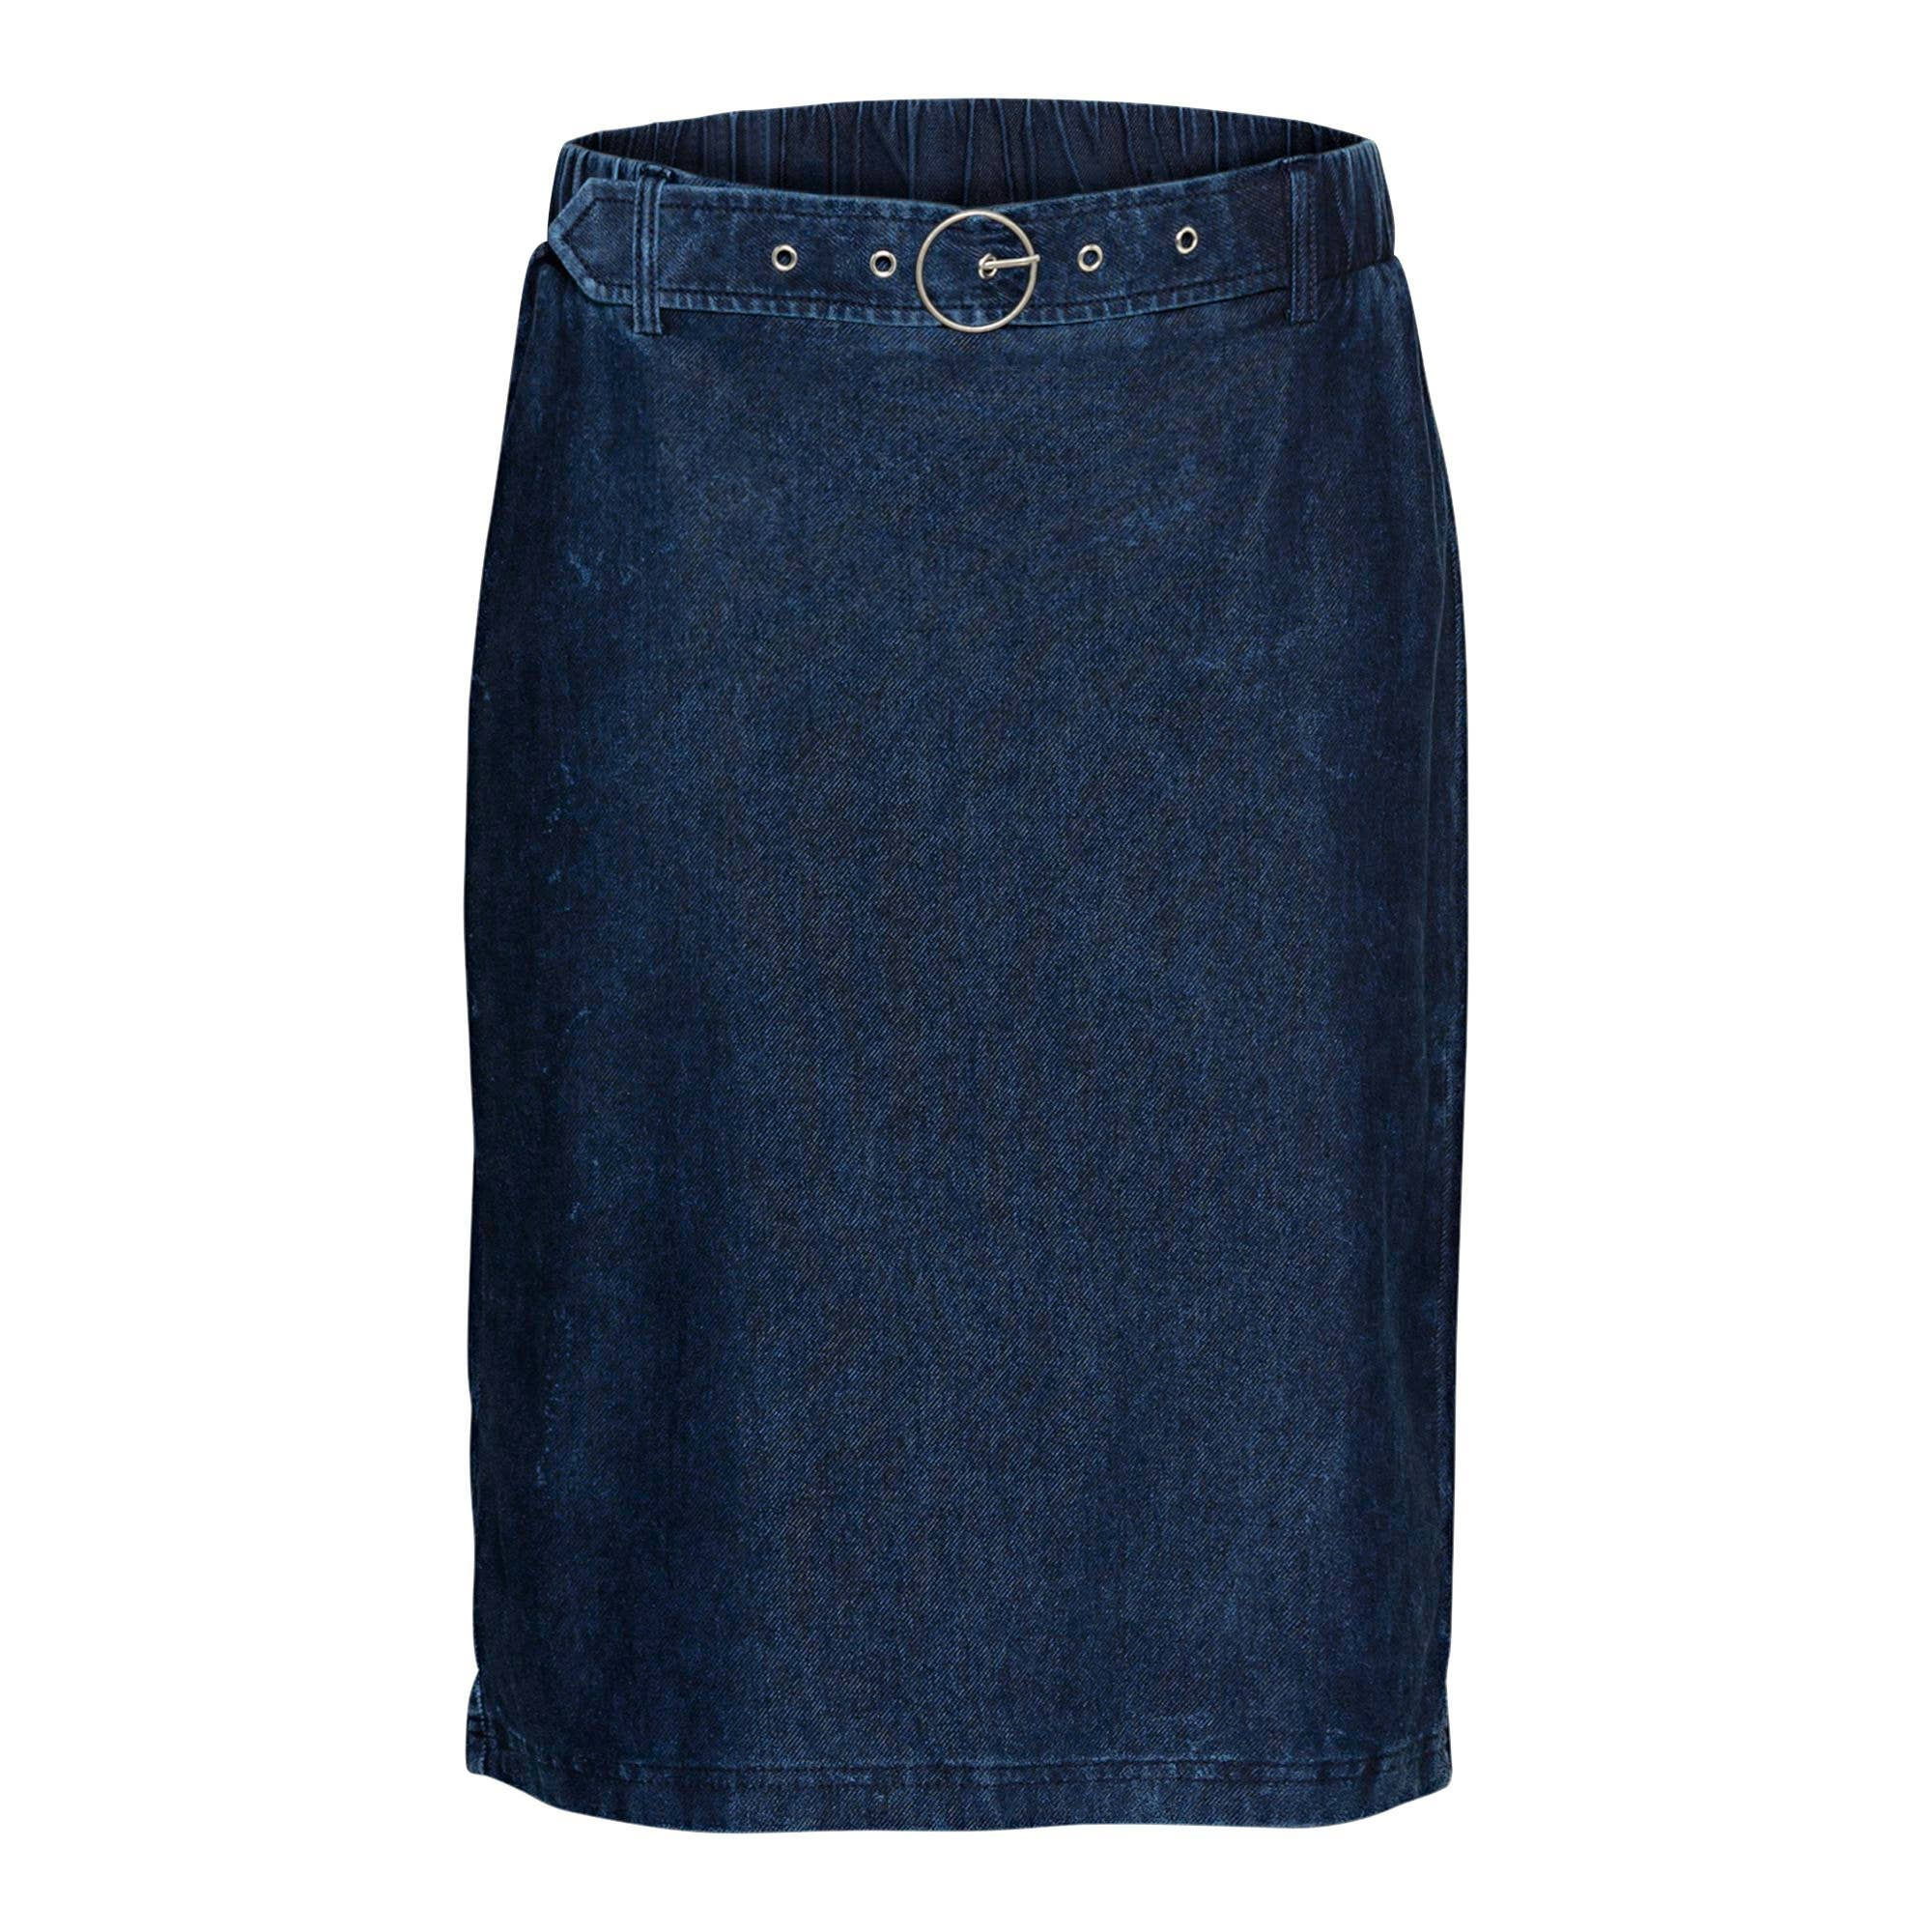 damen-rock in jeans-optik, mit gürtel